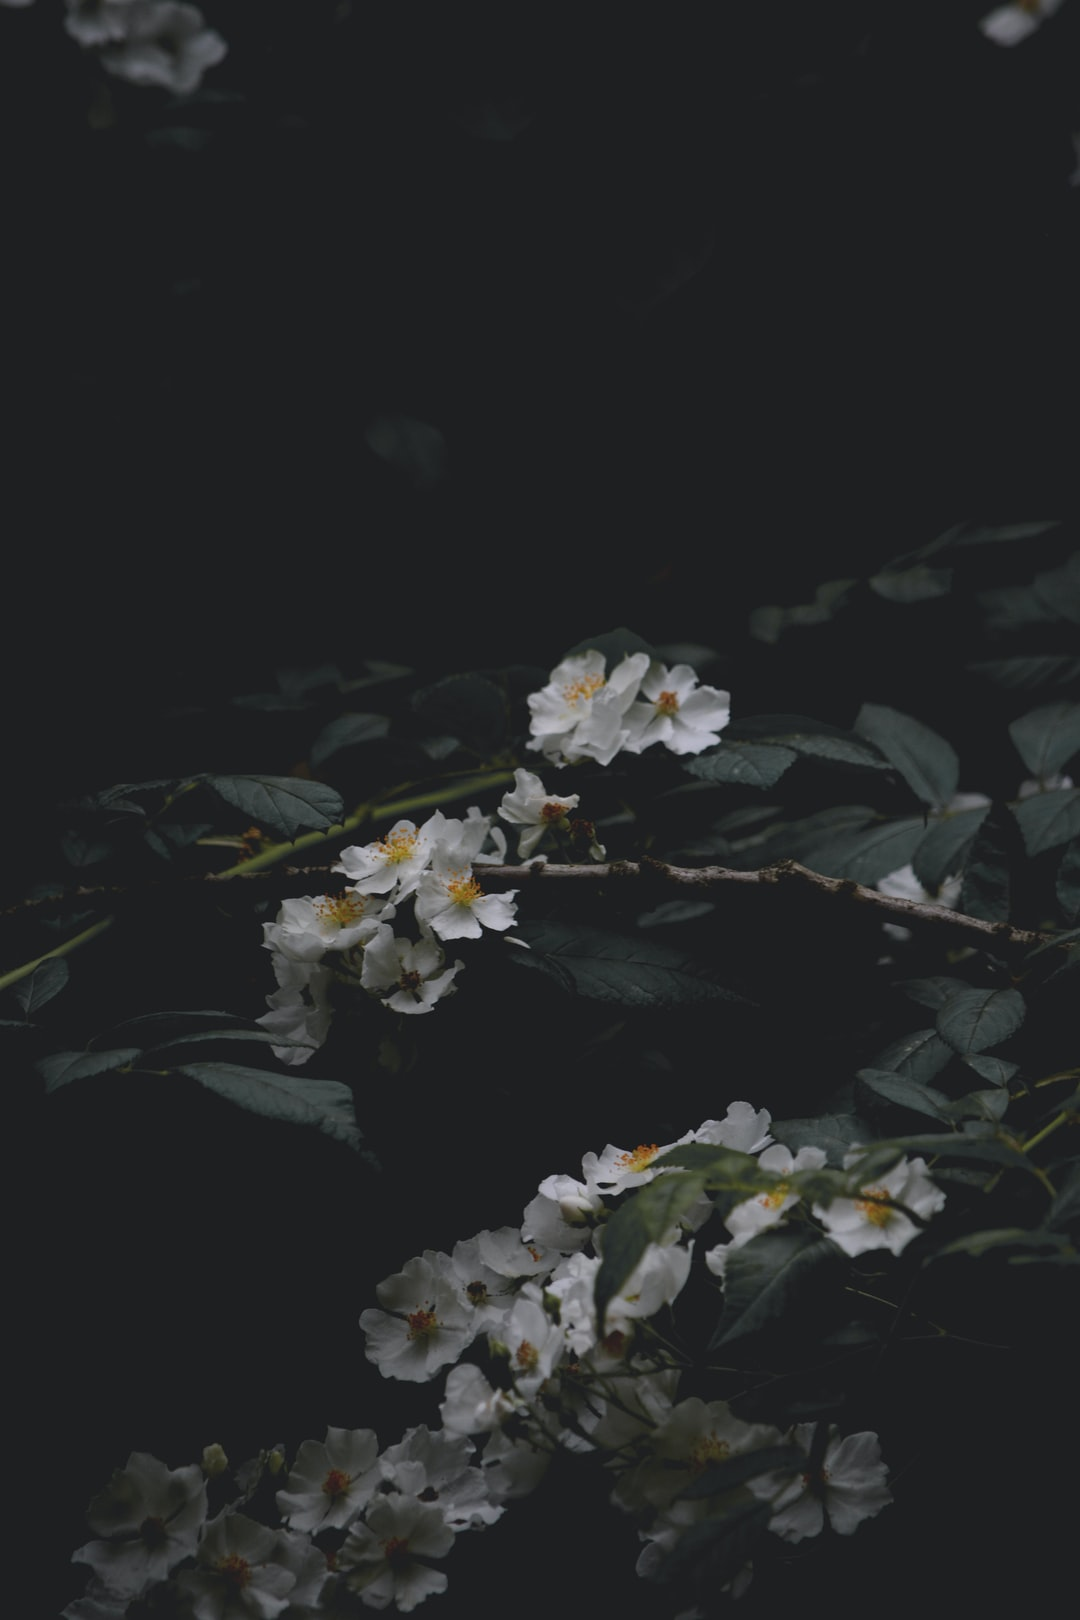 Moody Floral at Dusk